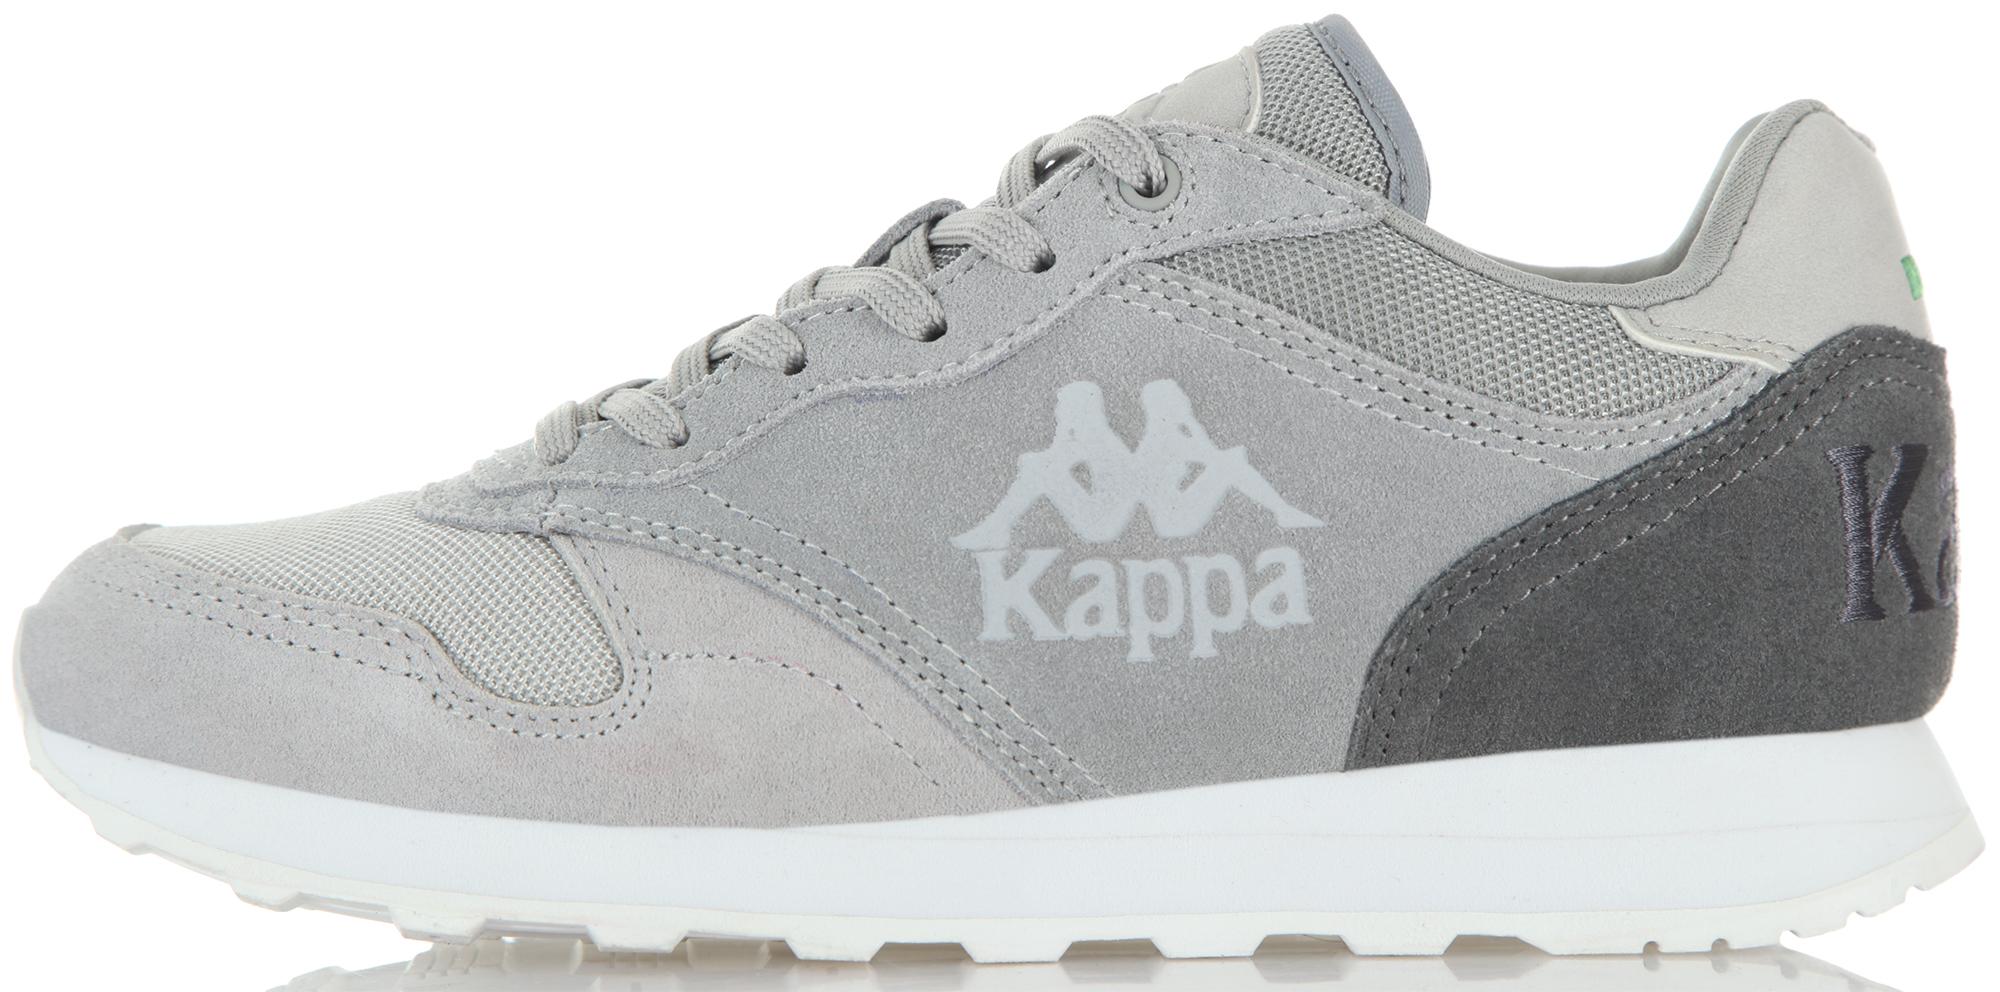 Kappa Кроссовки женские Kappa Authentic Run, размер 40 kappa кроссовки женские kappa linea